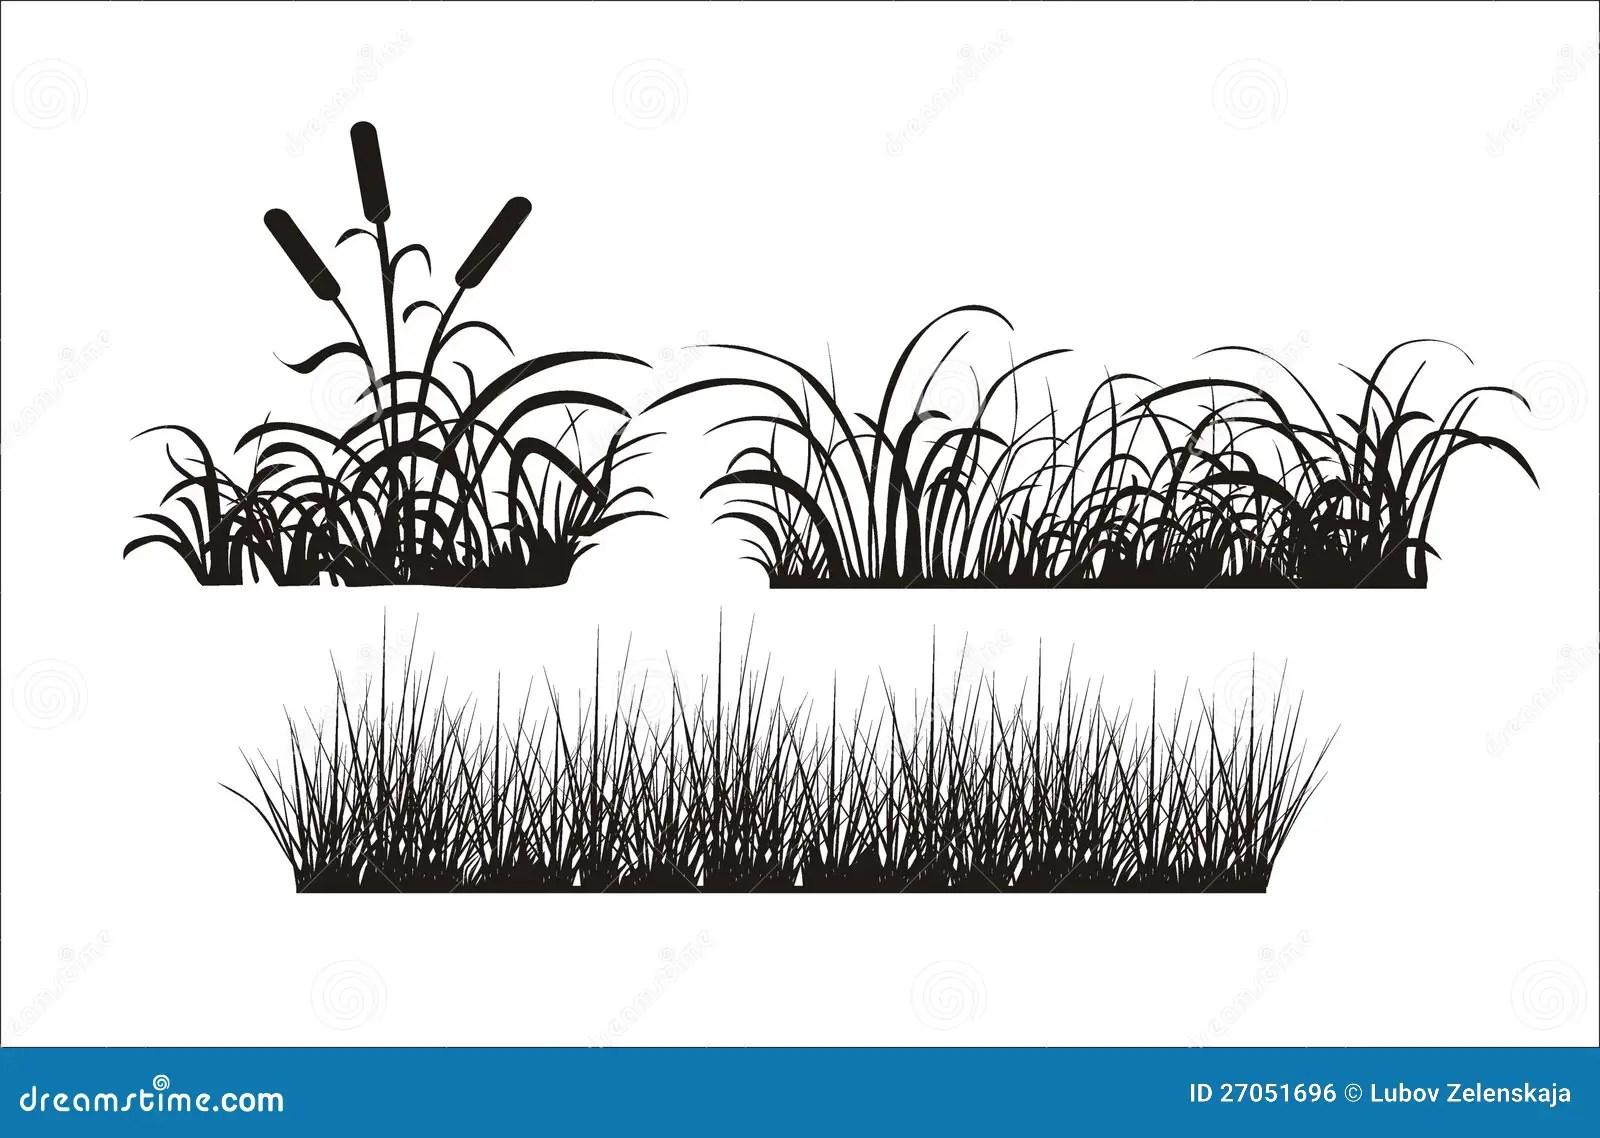 Silhouette Of Grass Stock Vector Illustration Of Shrub